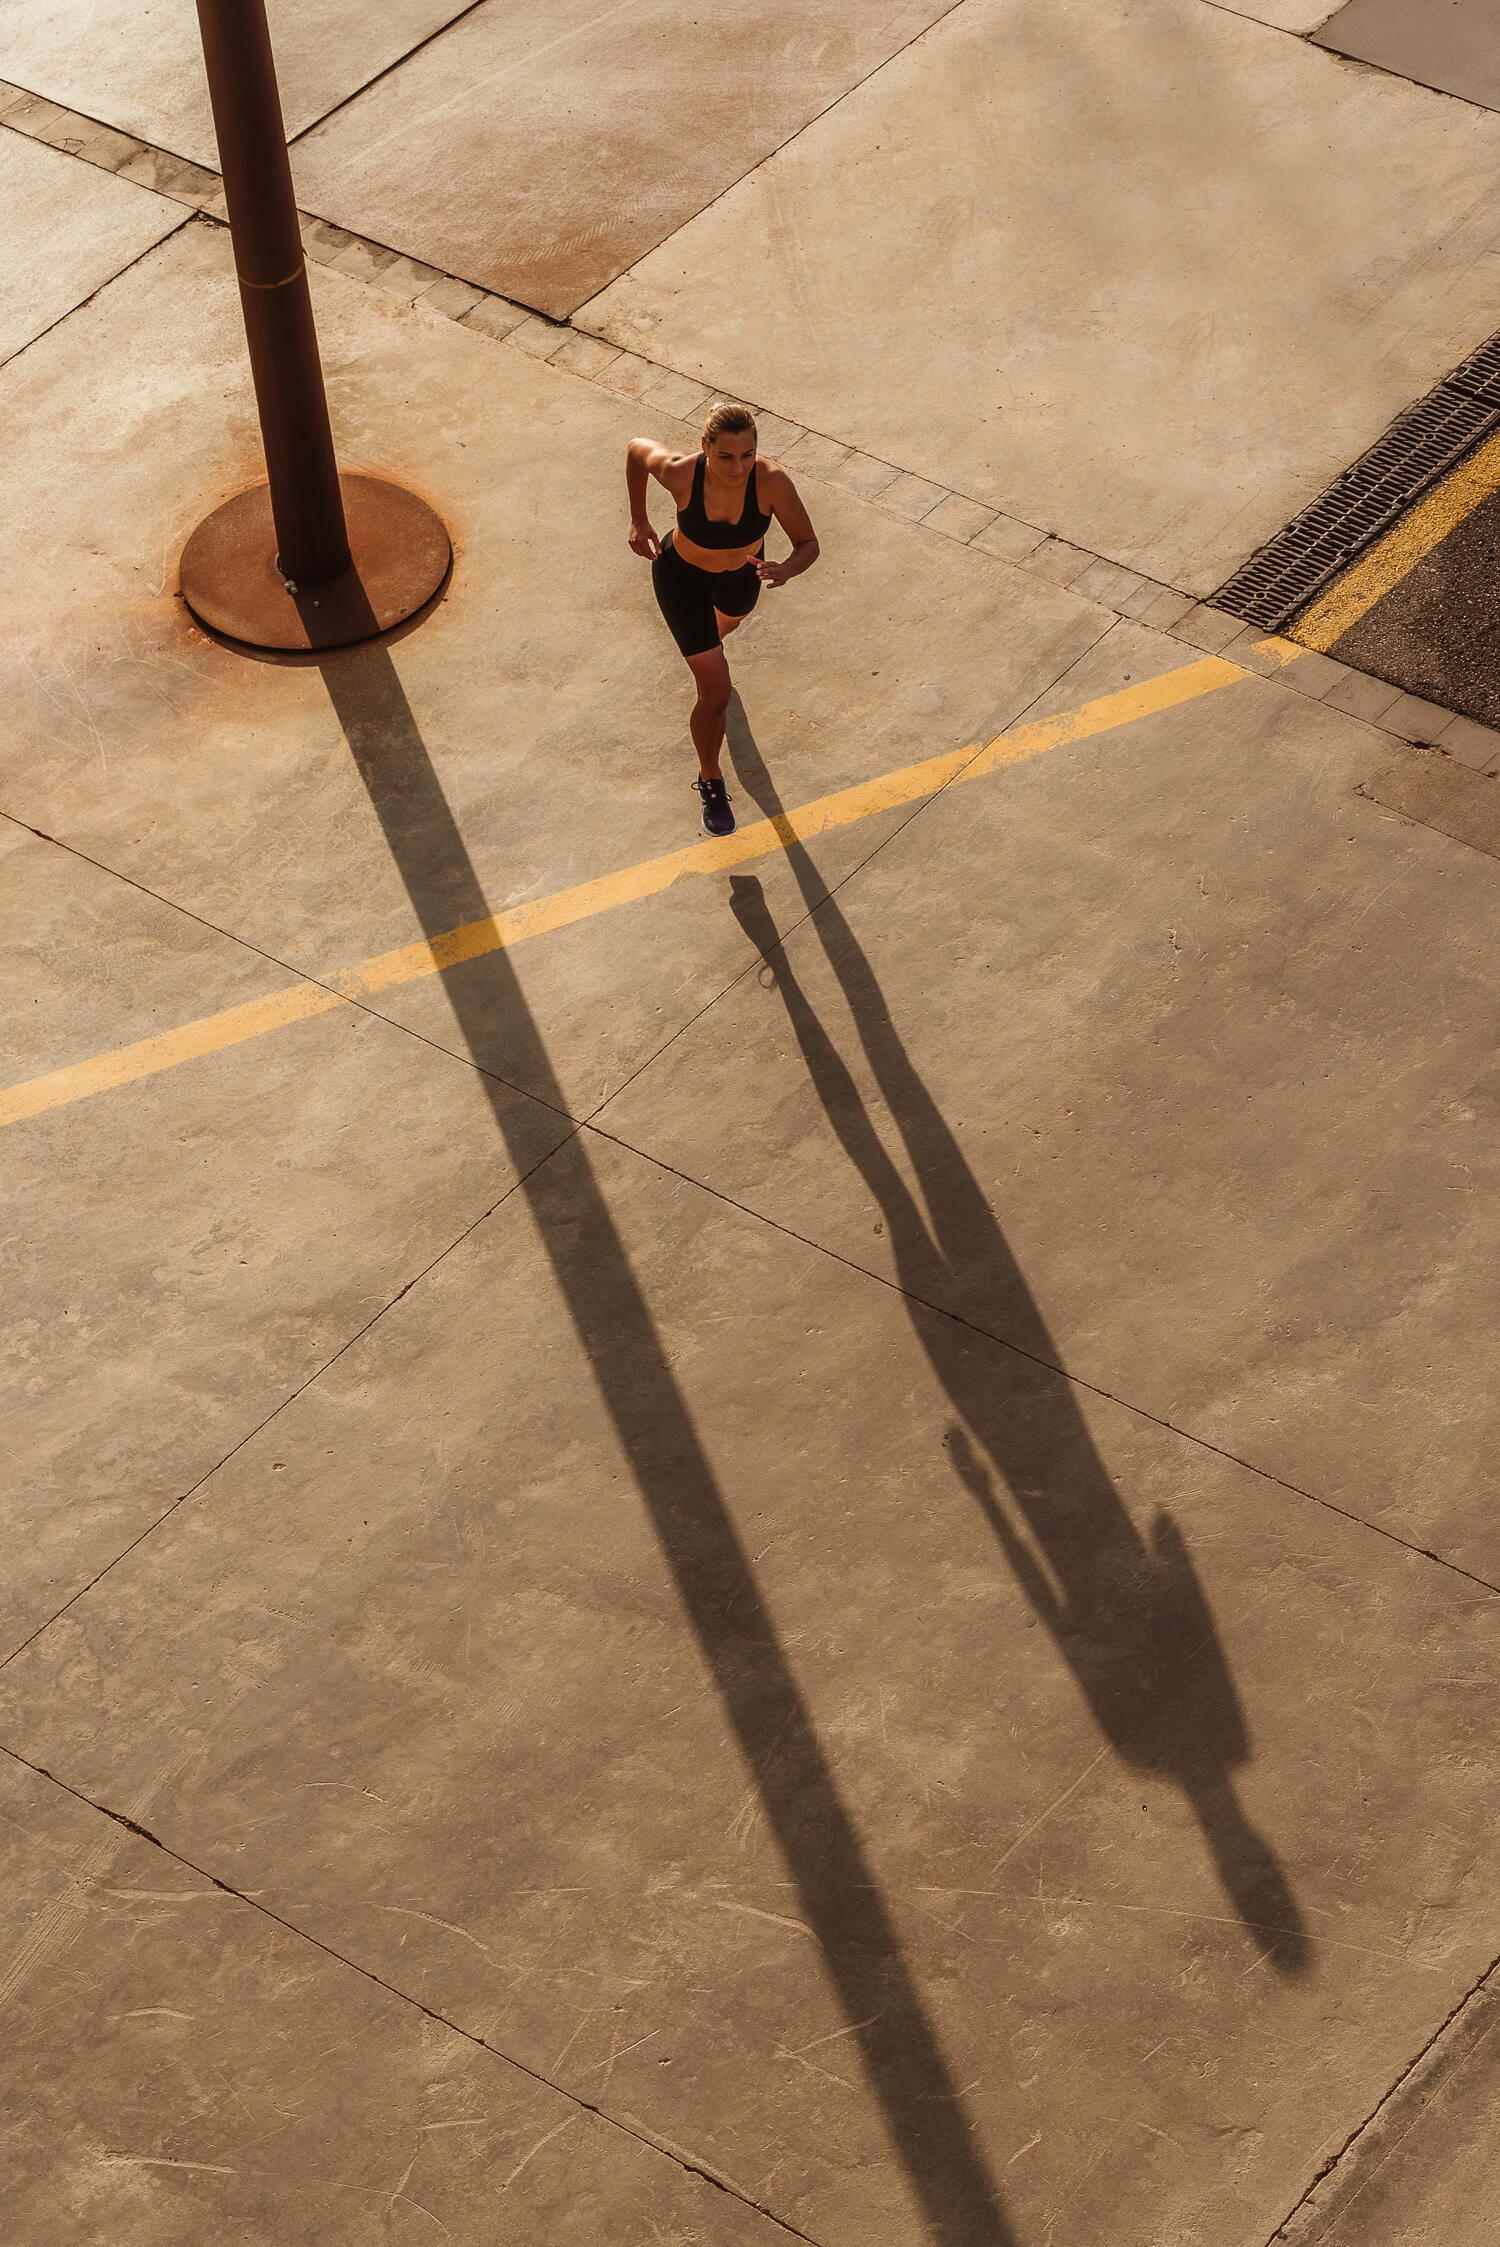 fitness model jogging